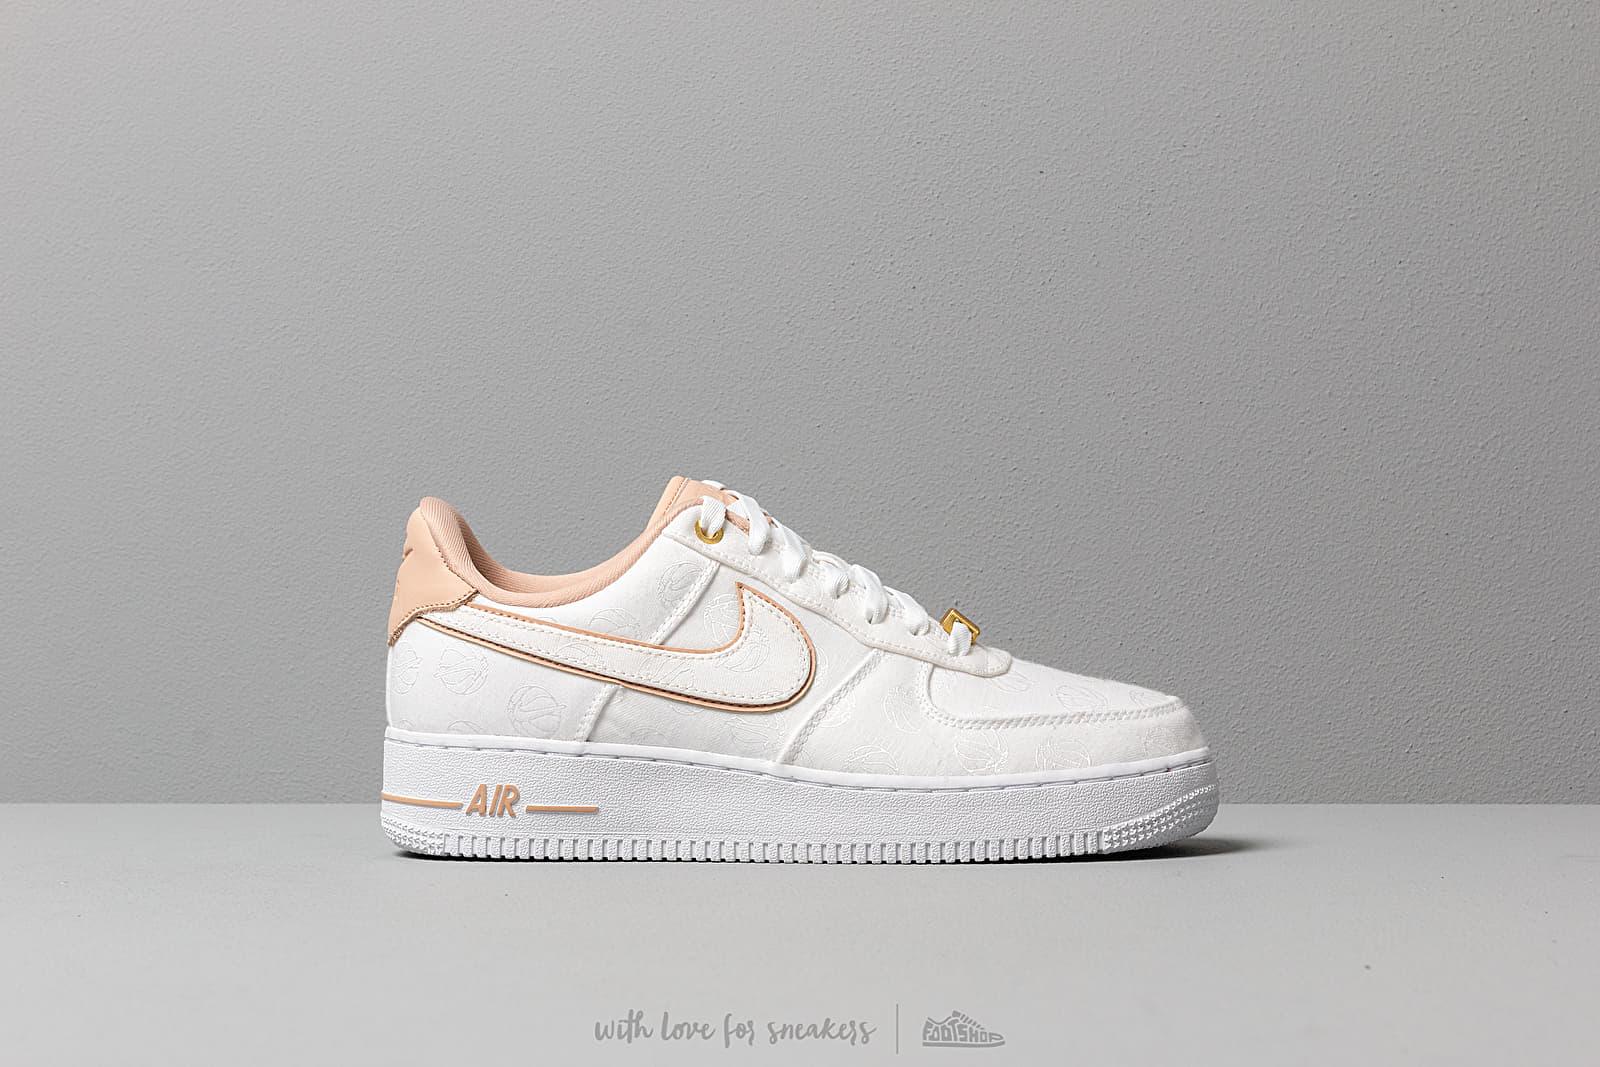 32f74c718a Nike Wmns Air Force 1 '07 Lx White/ Bio Beige-White-Metallic Gold ...